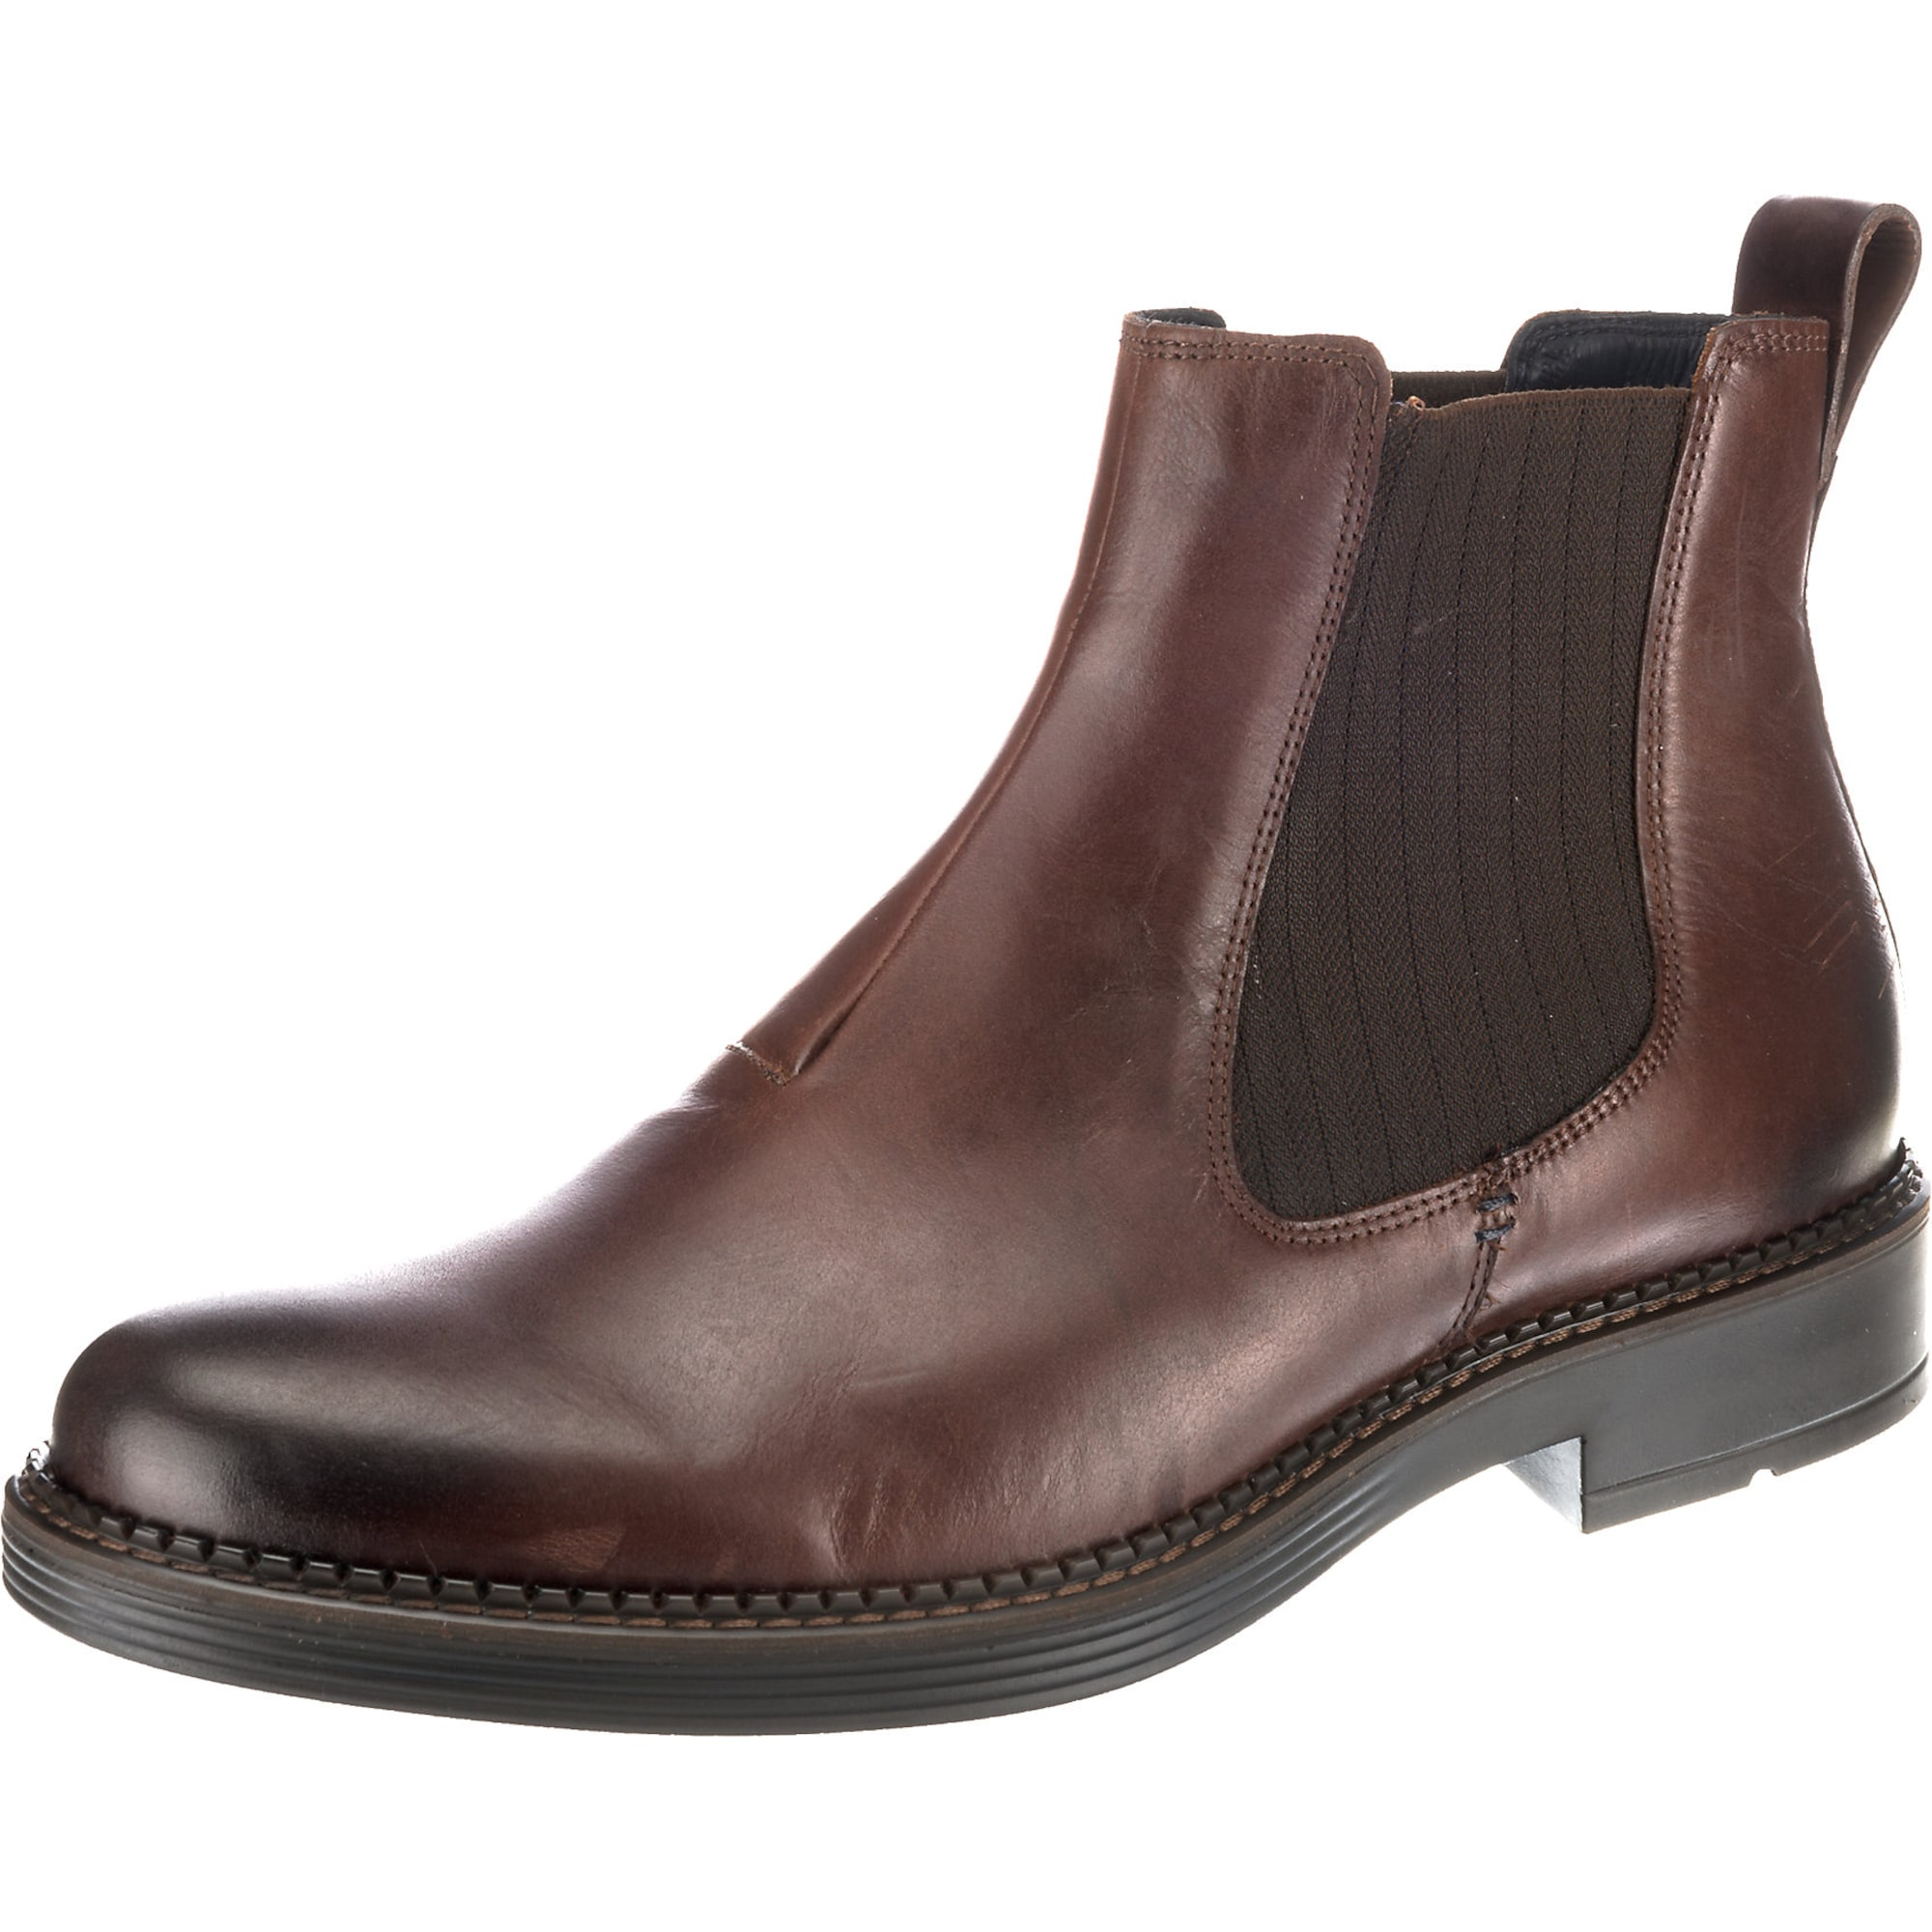 Boots 'Newcastle' | Schuhe > Boots > Sonstige Boots | Braun | ECCO